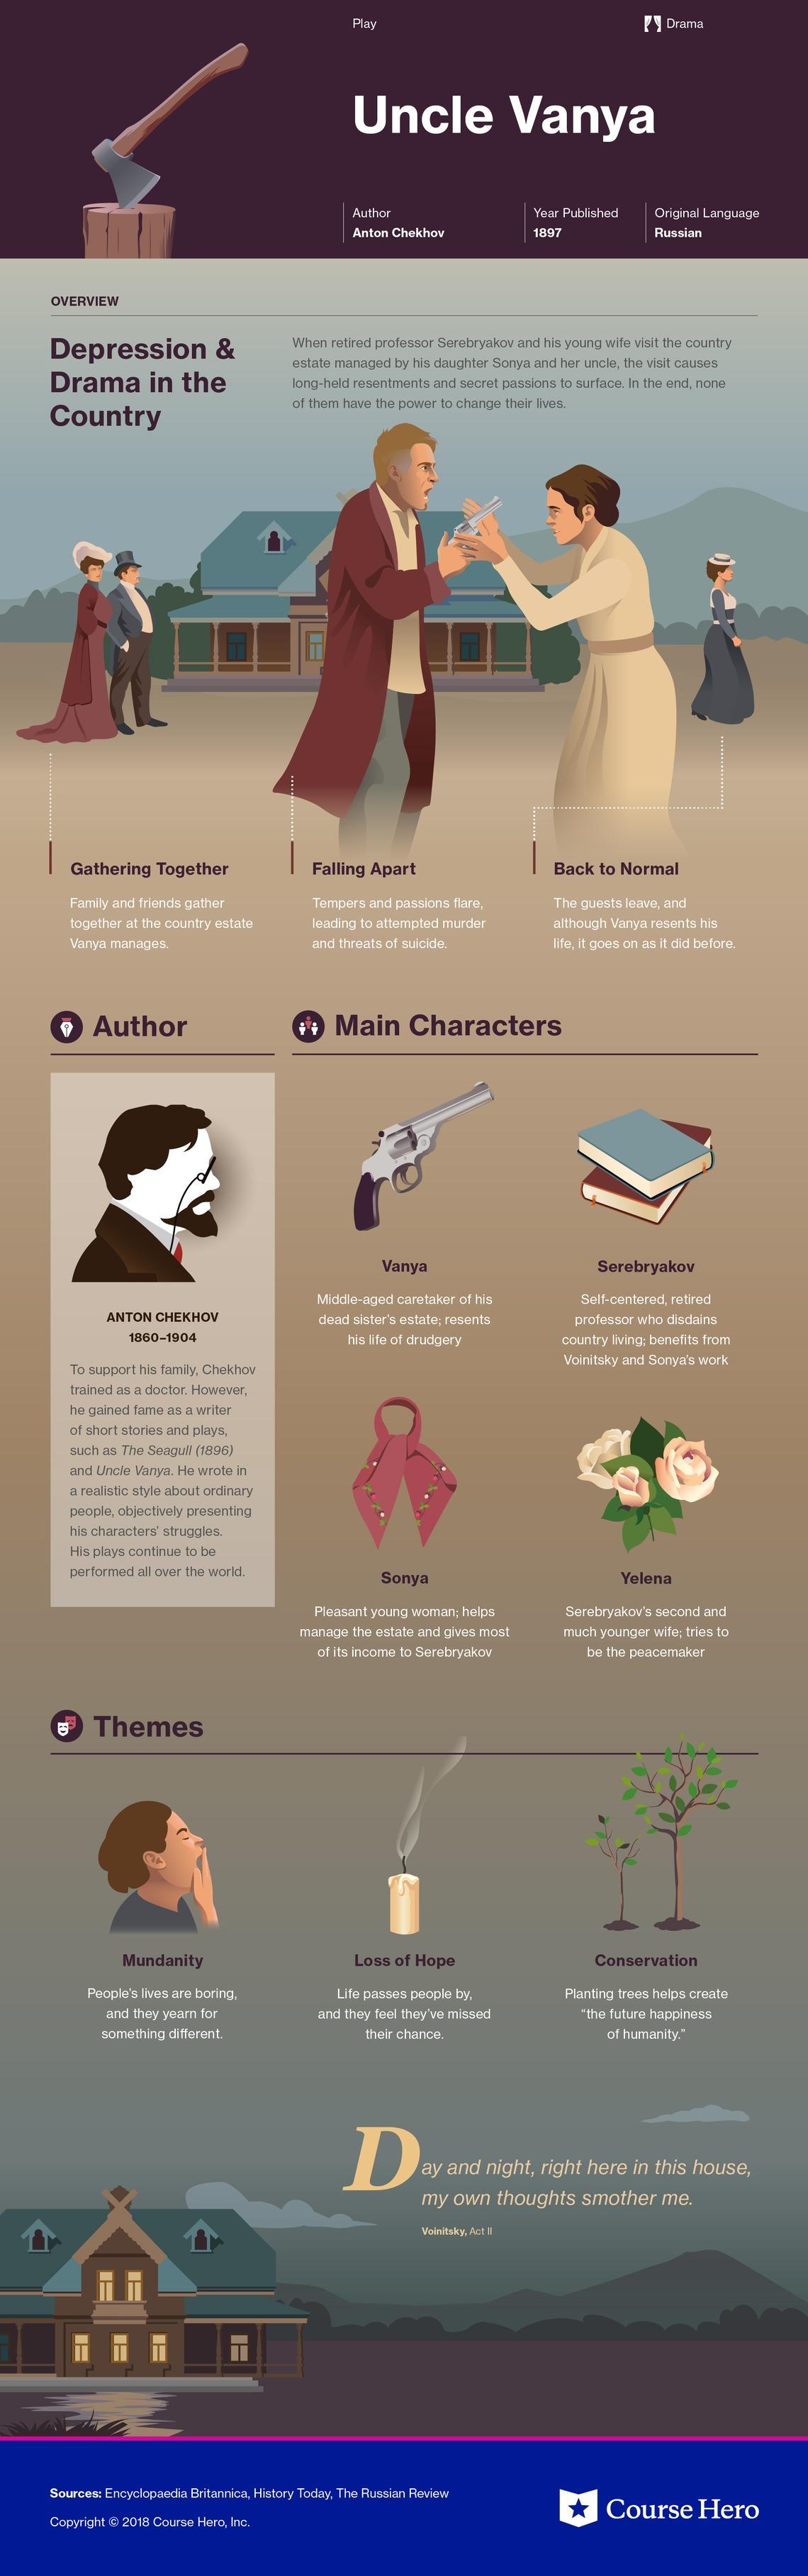 Be Book-Smarter.